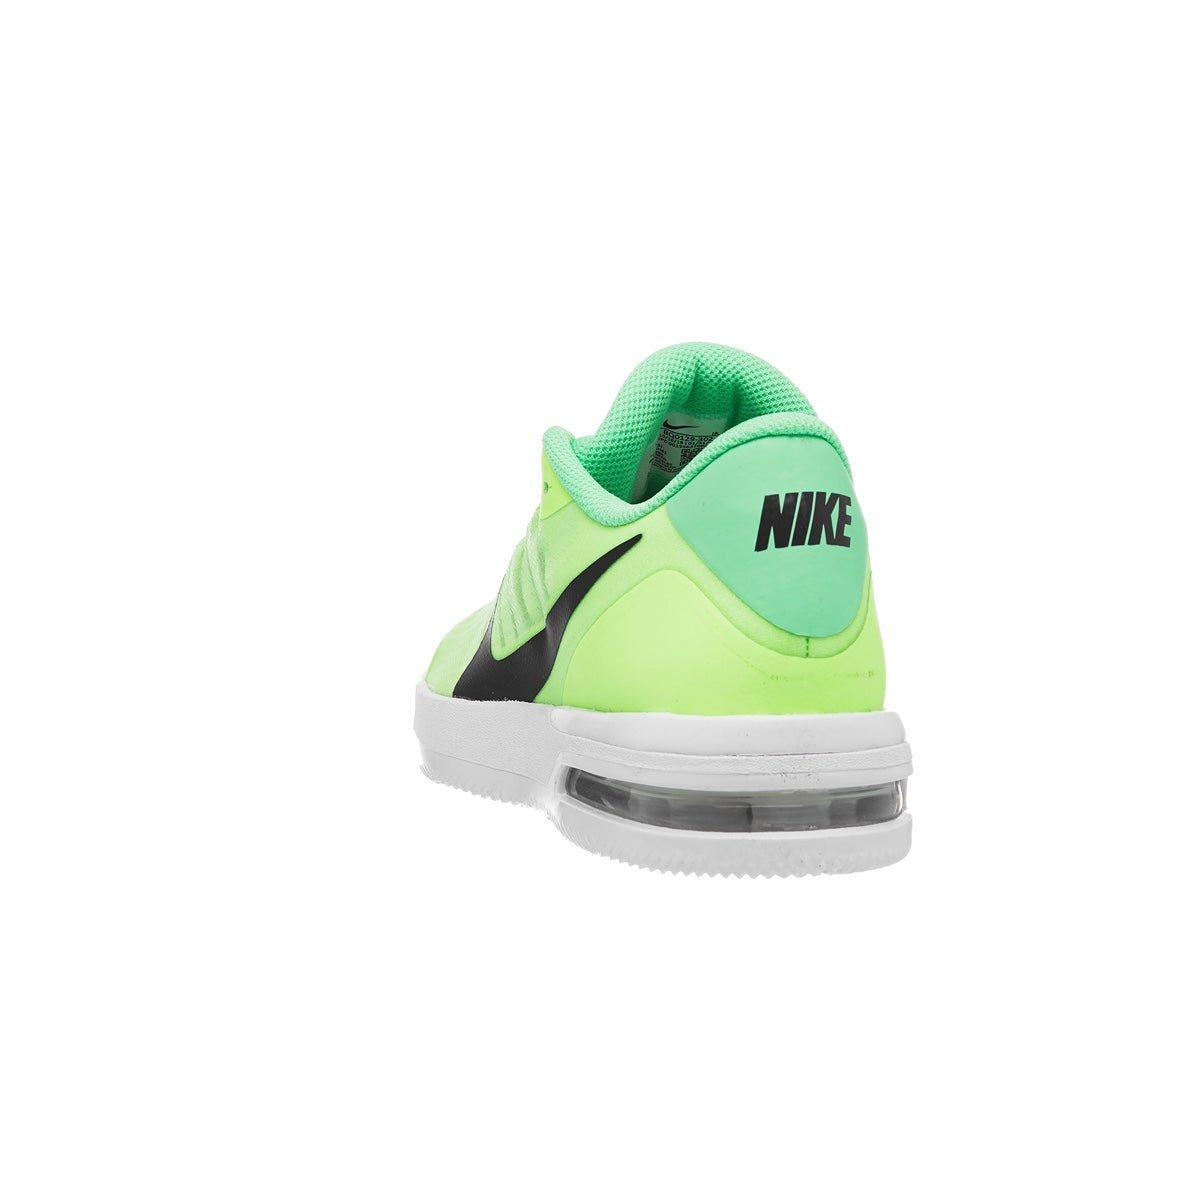 Nike Air Max Vapor Wing MS Ghost Green Men's Shoe 360° View ...